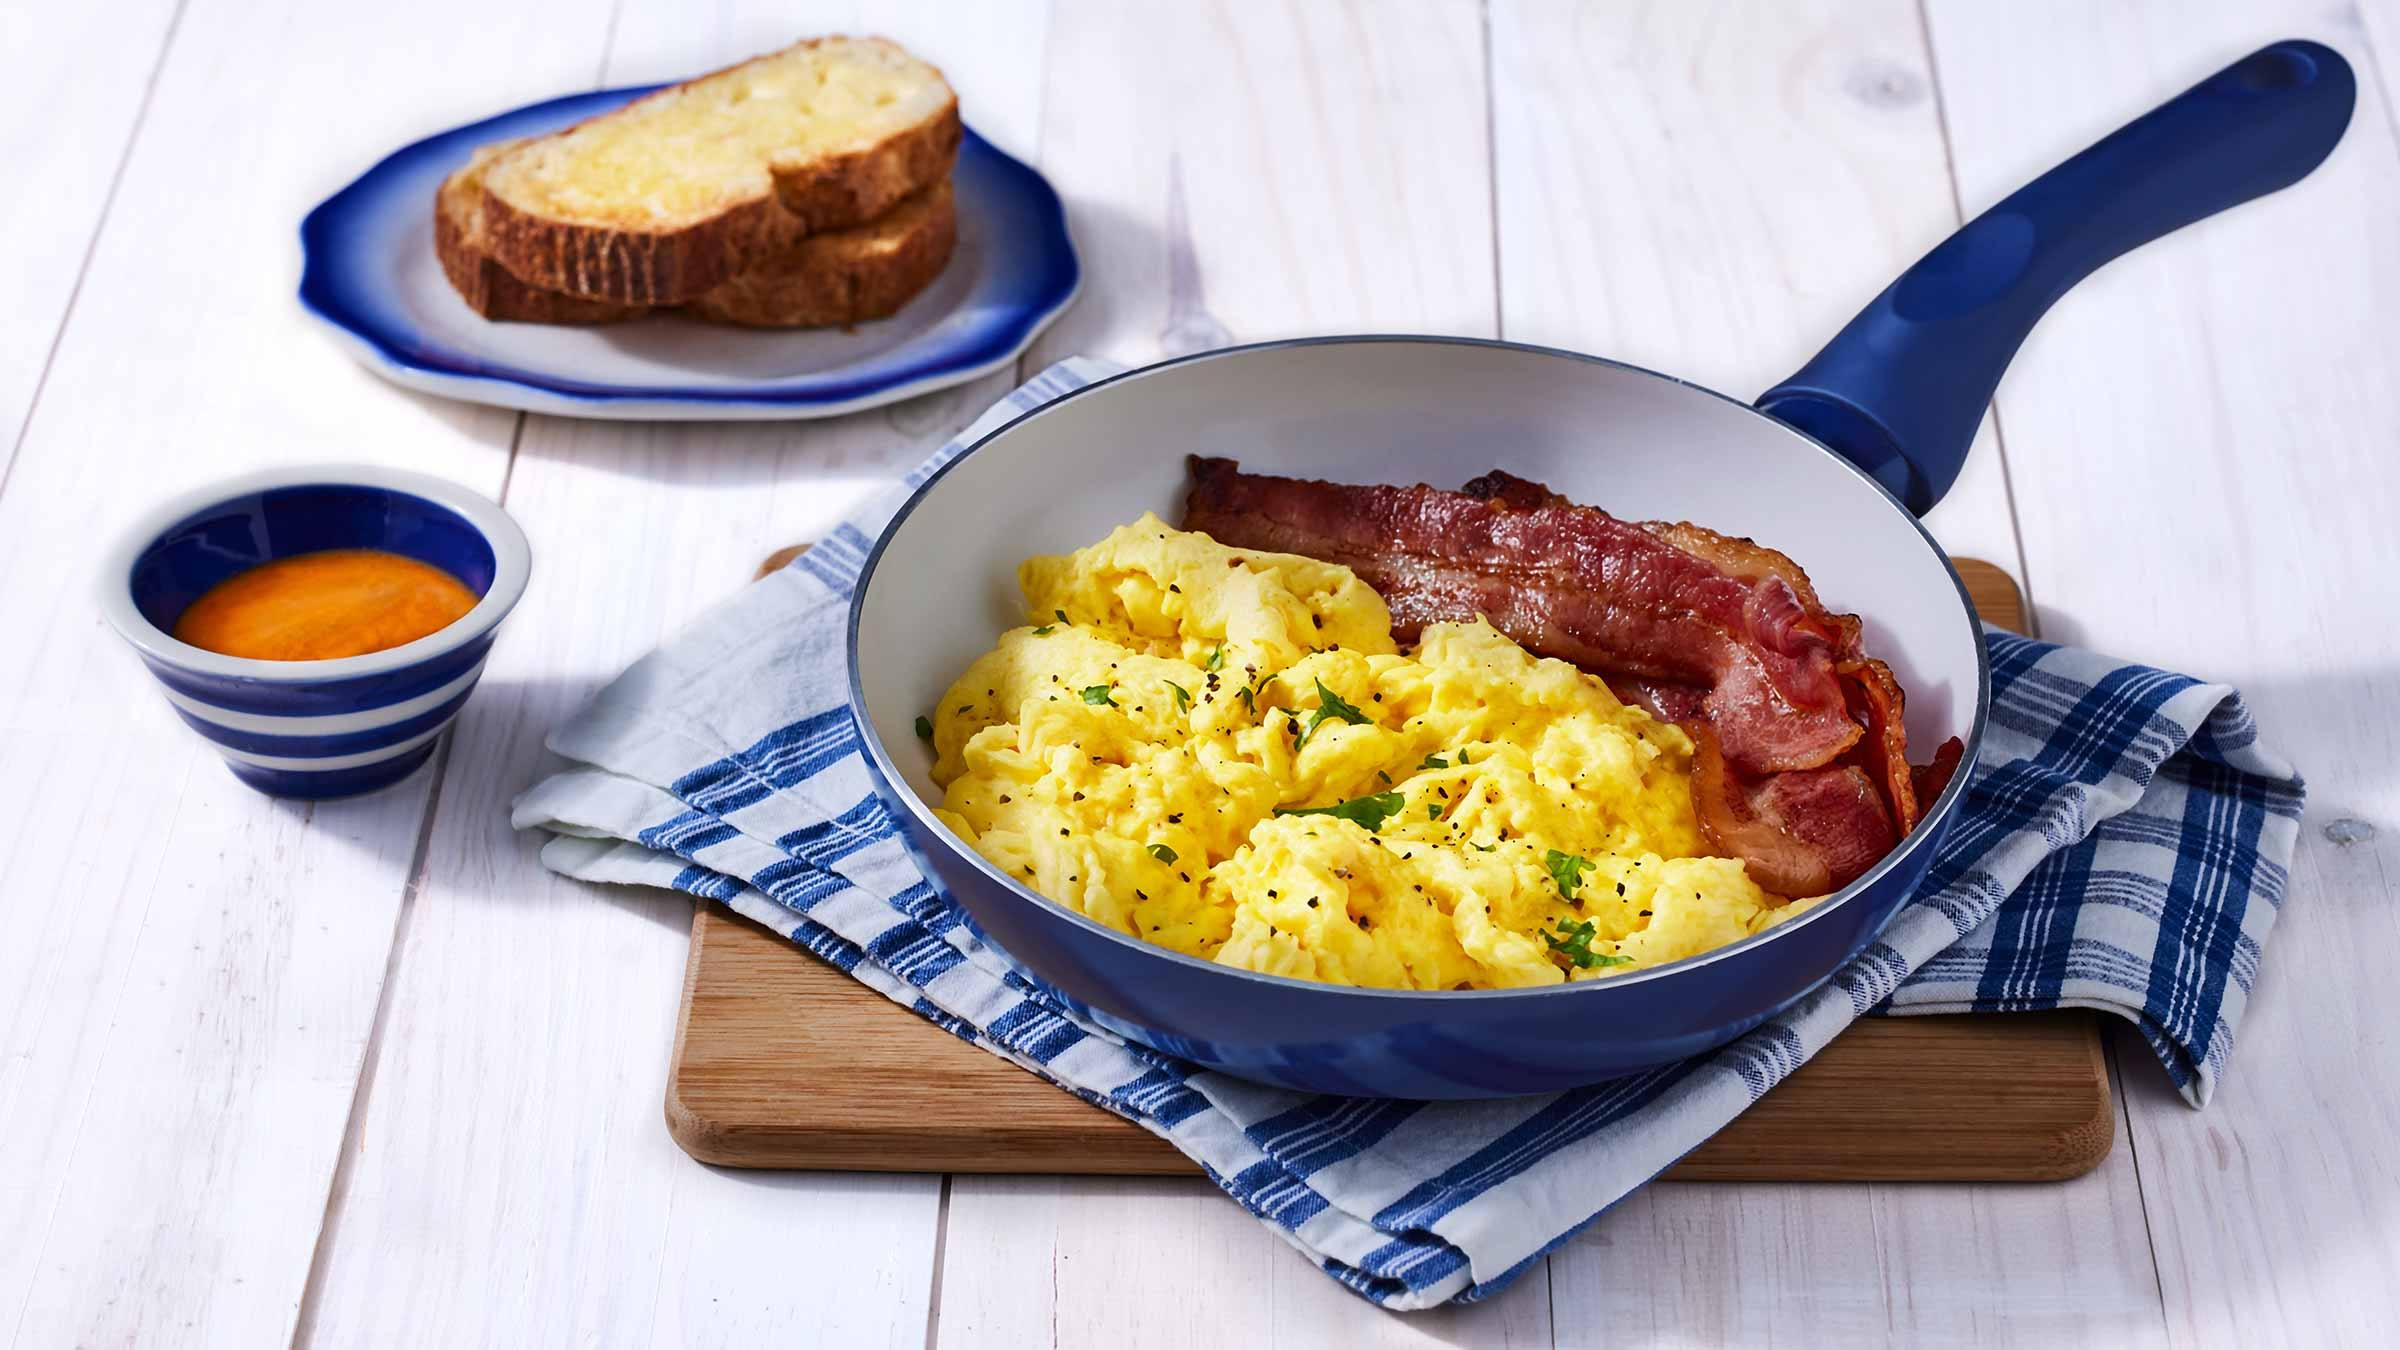 Tender and Fluffy Scrambled Eggs Recipe